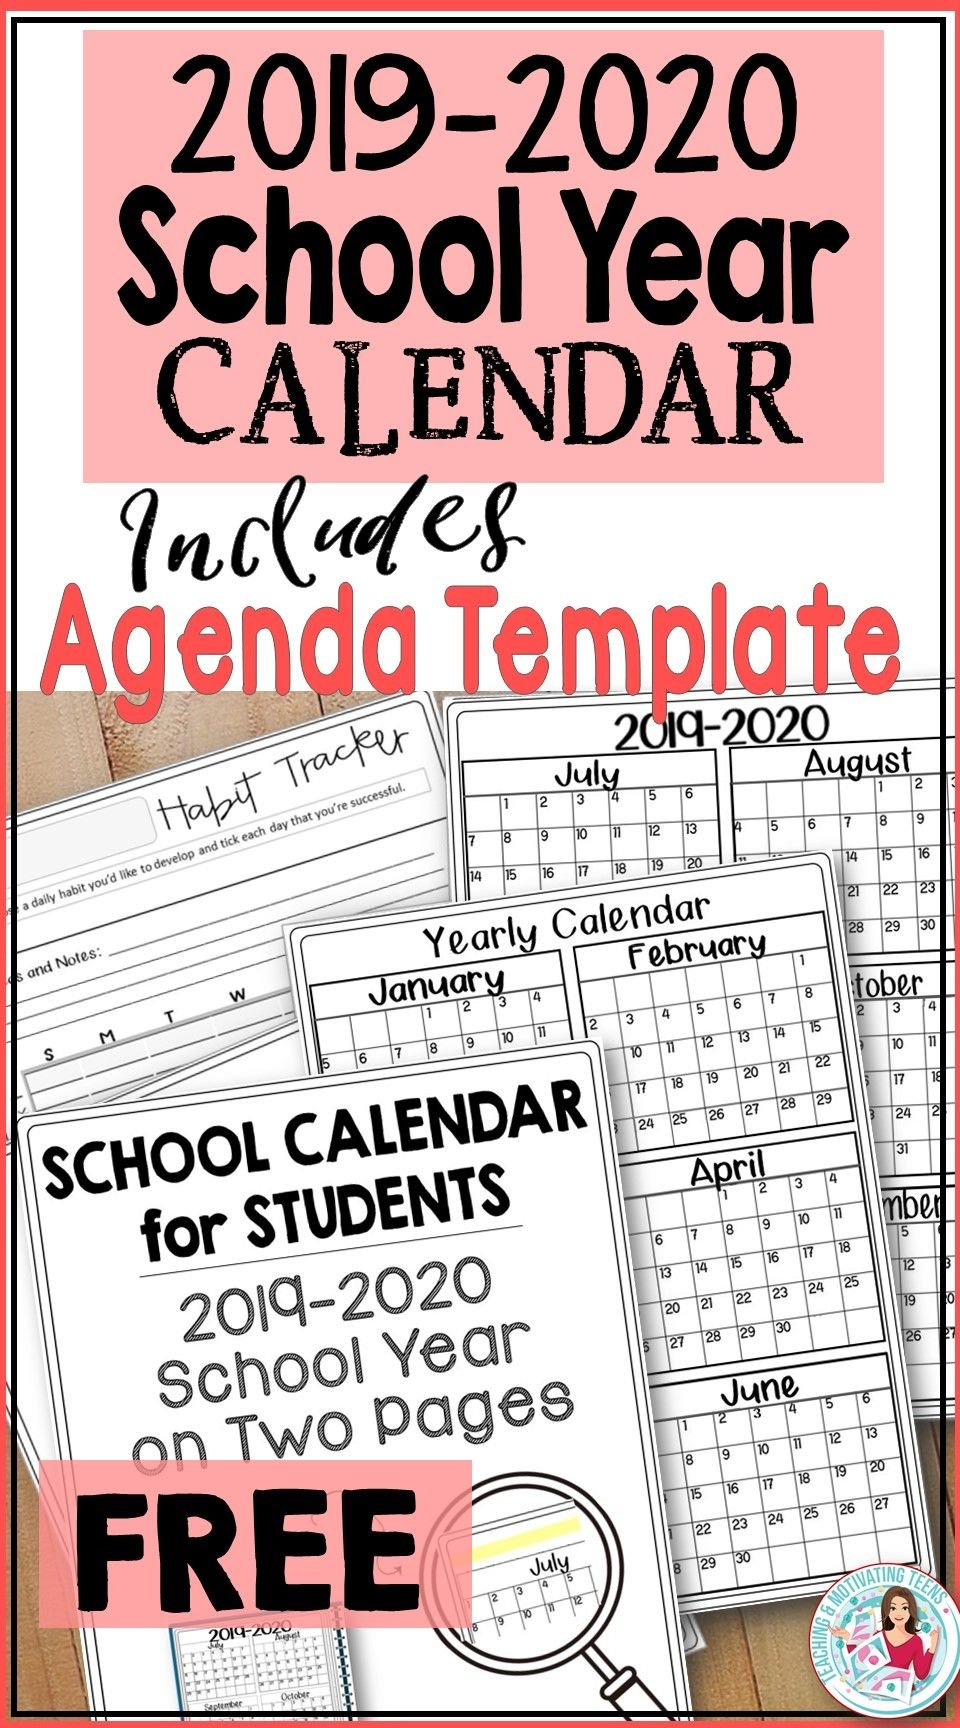 2019 2020 Back To School Calendar For Students & Teachers Free School Calendars For Teachers